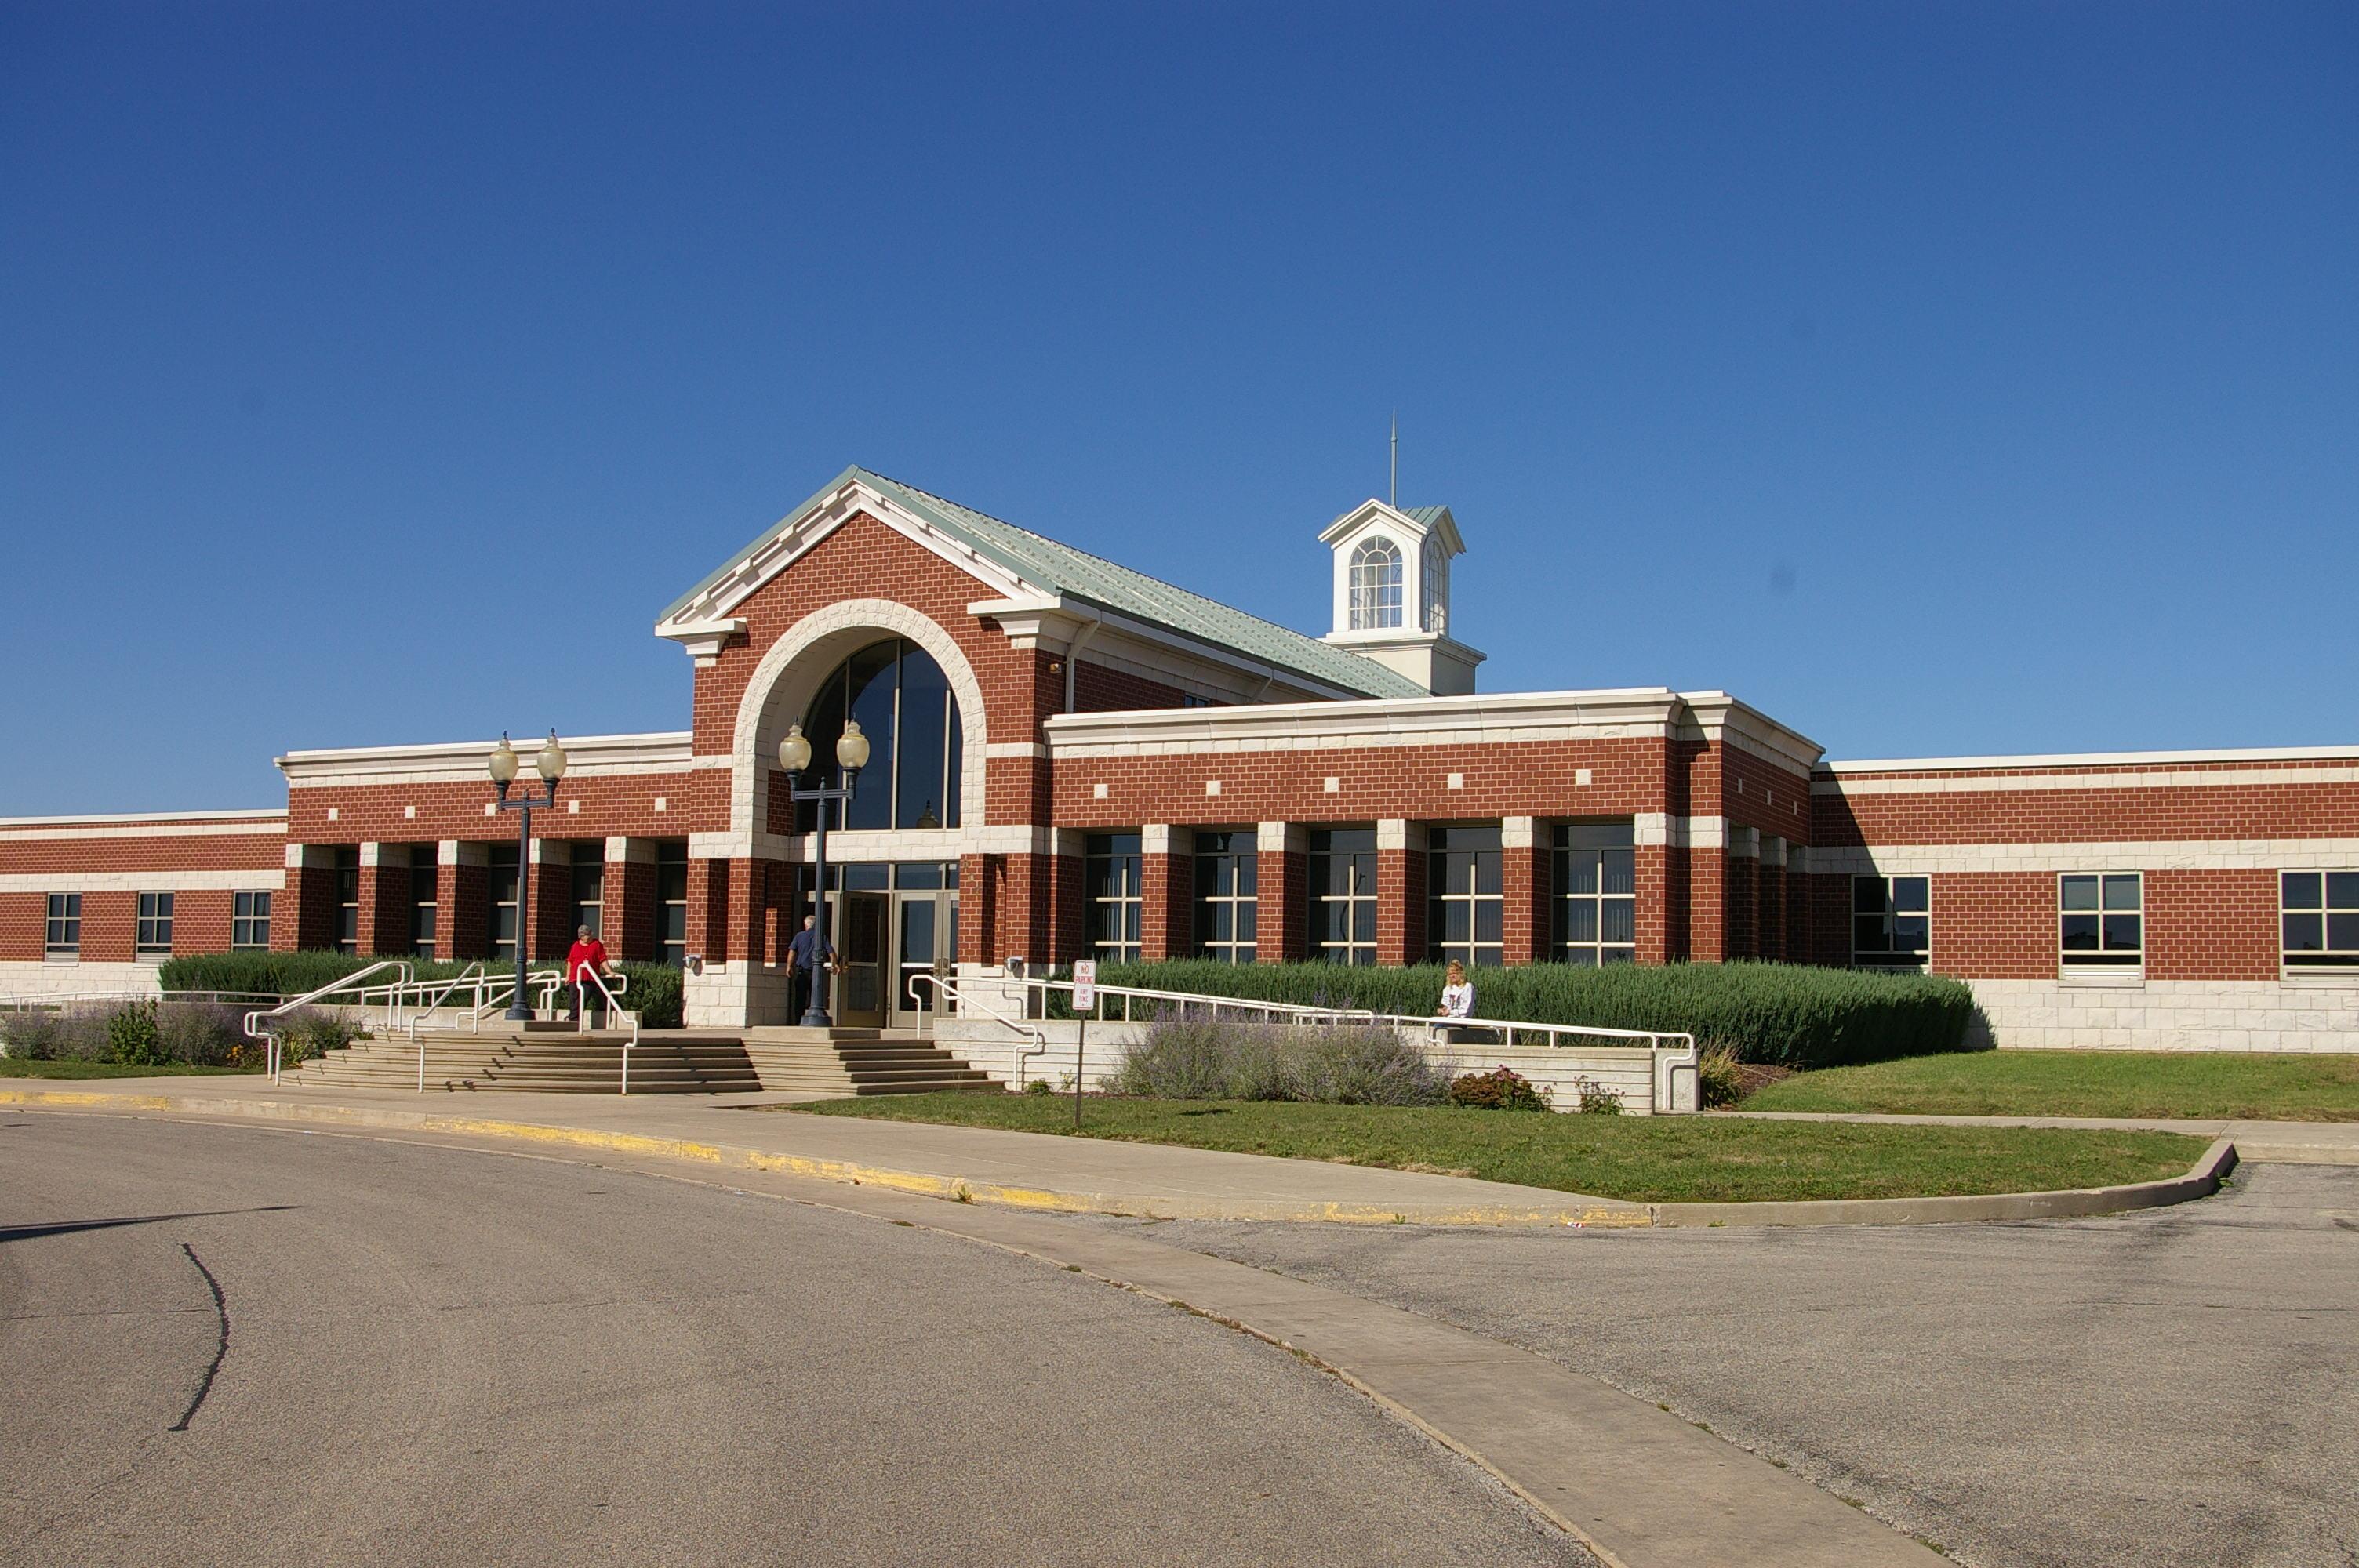 Illinois kendall county oswego - 0239k07